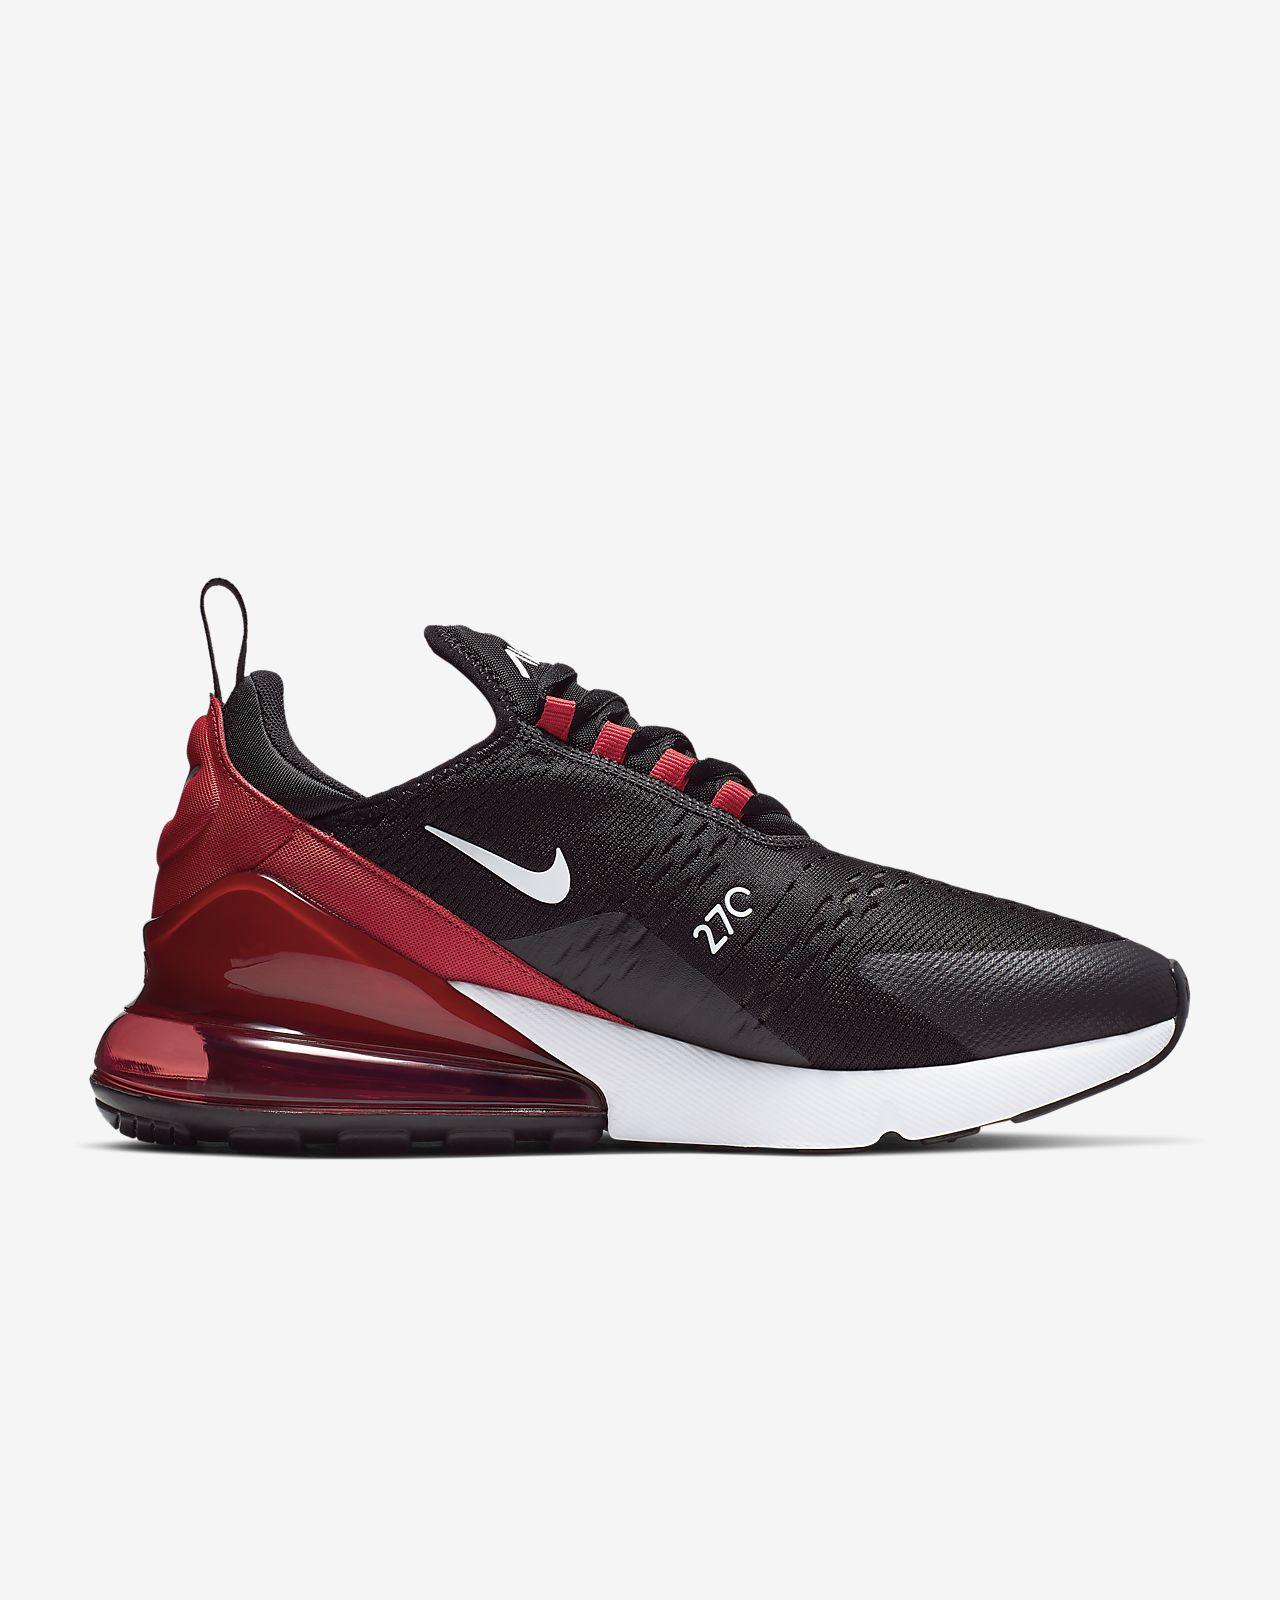 the best attitude 7258d 0b26f Nike Air Max 270 Men's Shoe